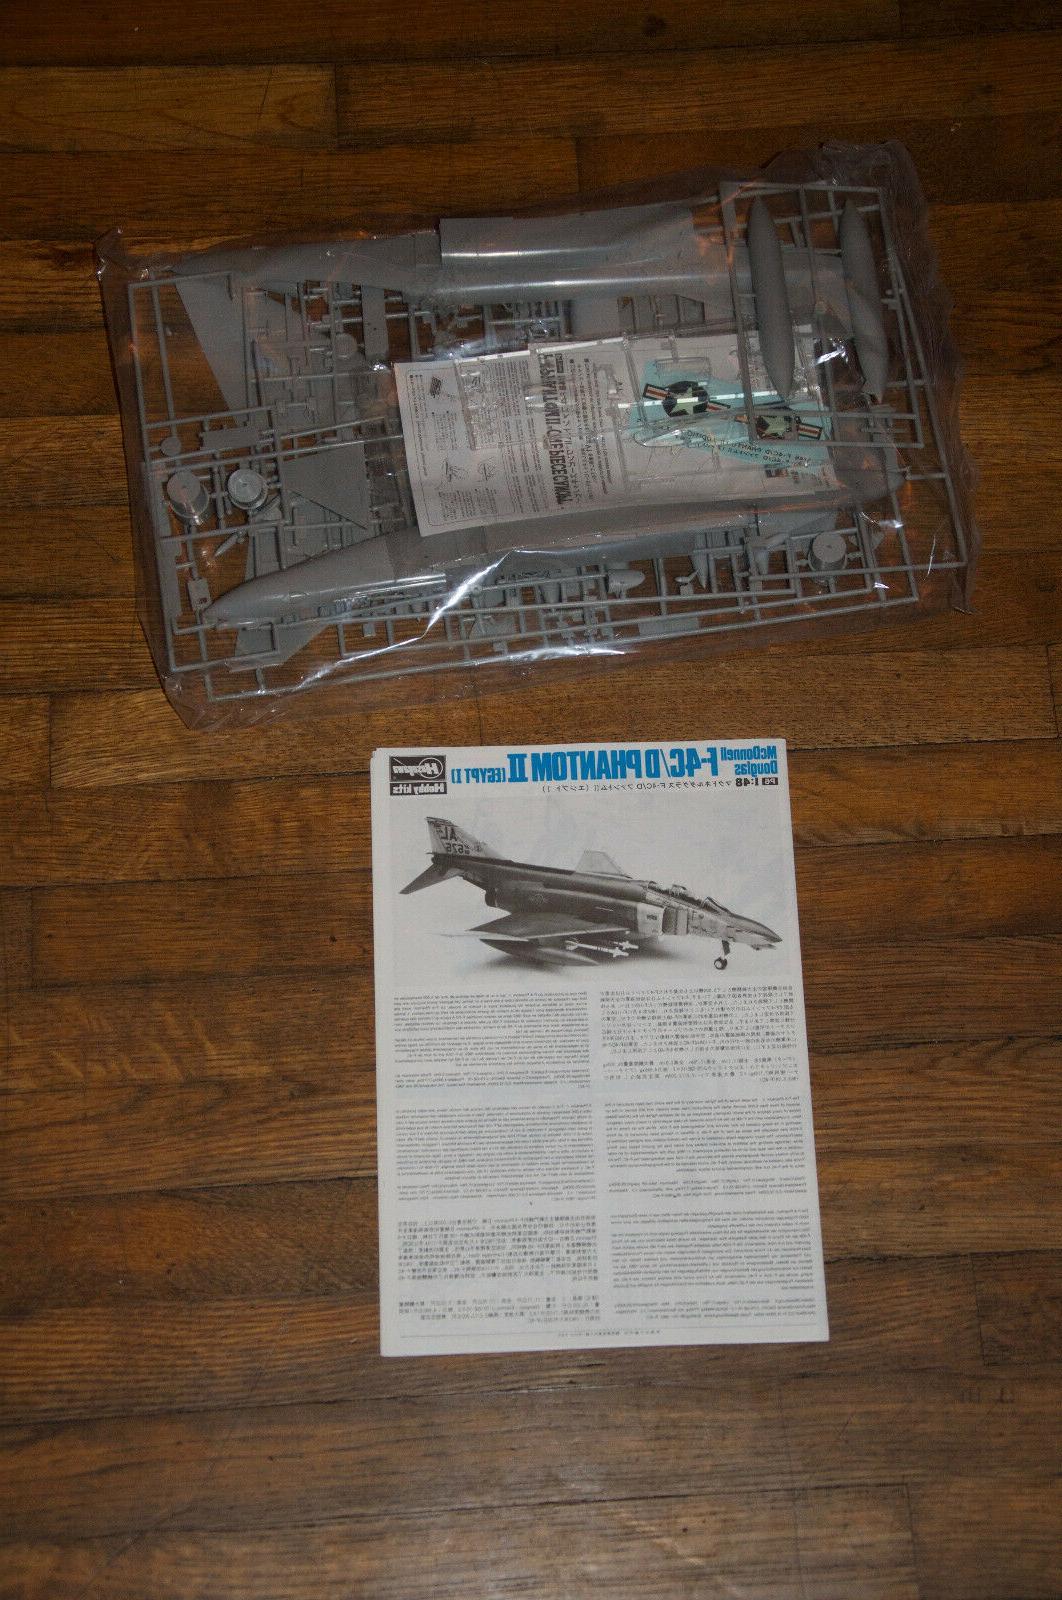 Hasegawa Phantom Egypt 1/48 Scale #07211 Aircraft